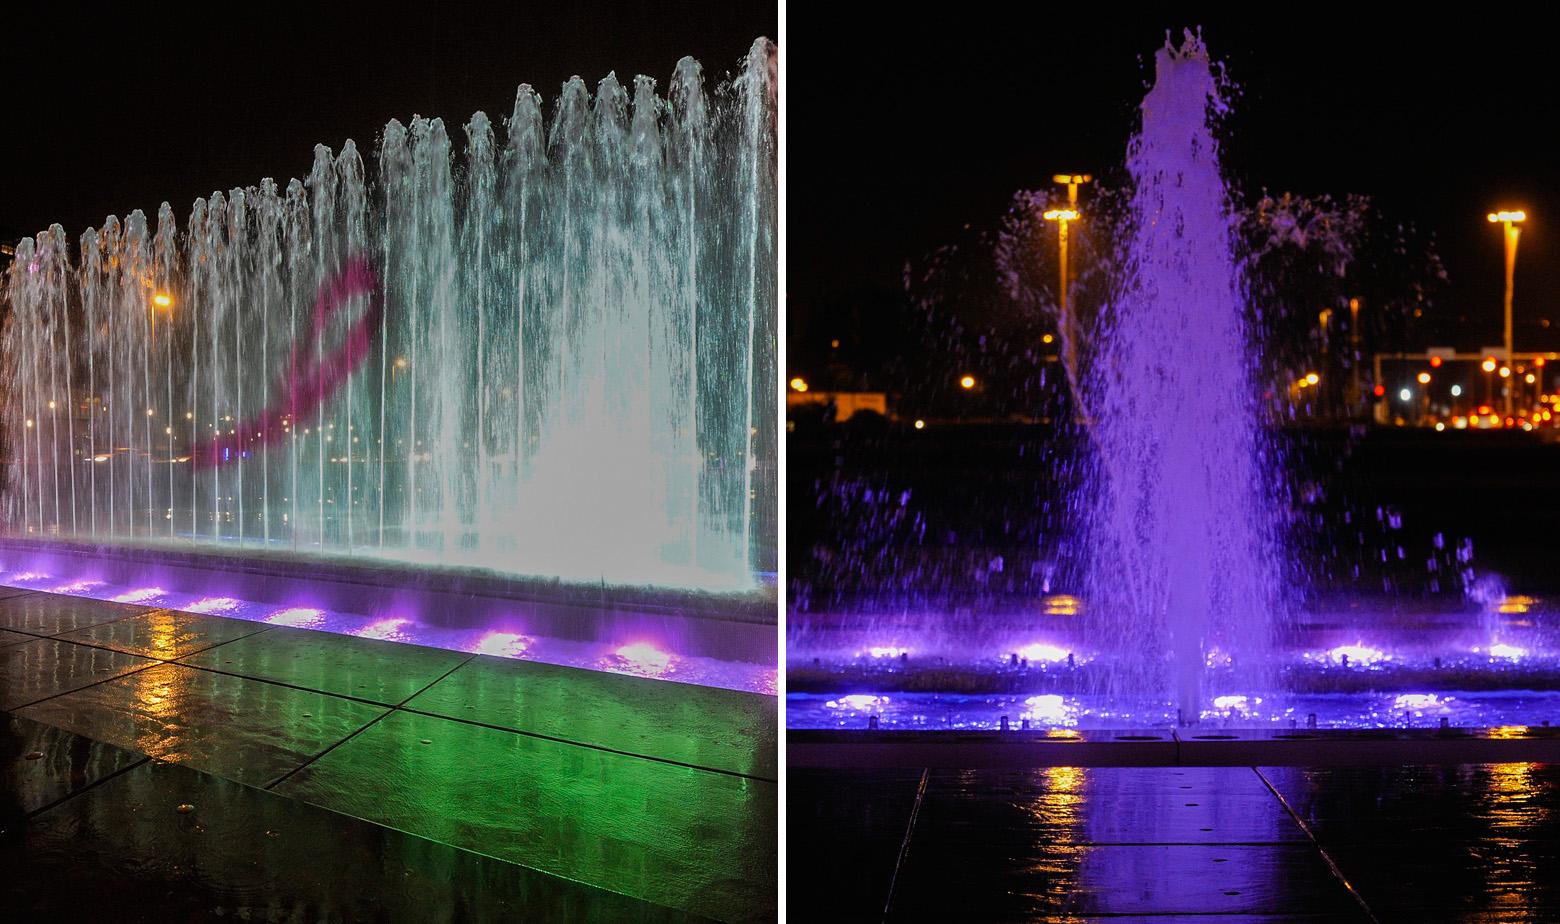 Ružičaste fontane